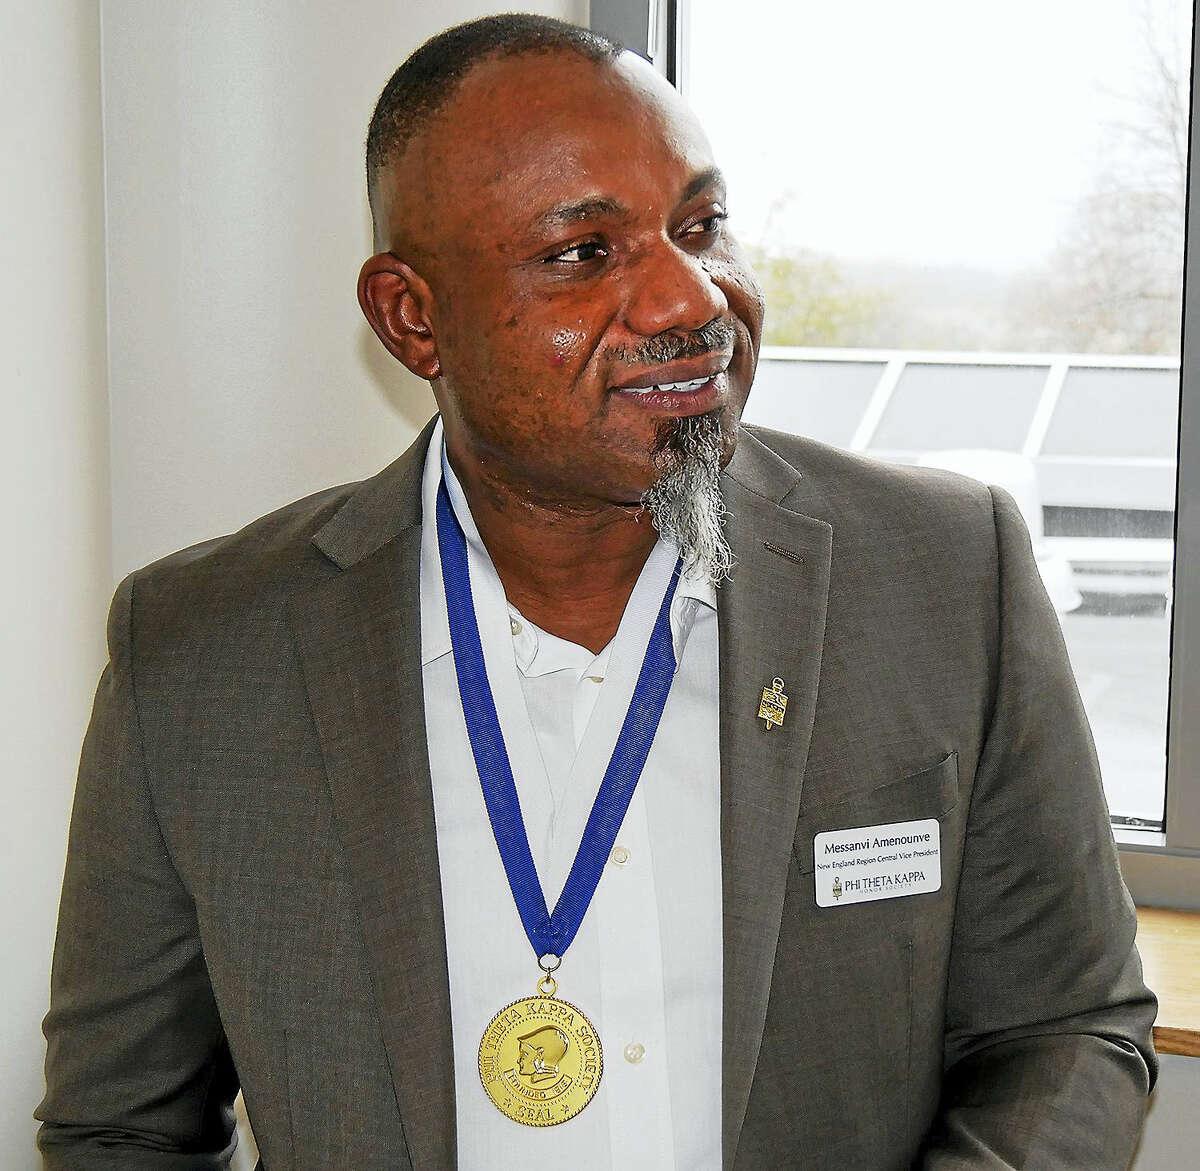 Messanvi Patrick Amenounve of Meriden, MxCC PTK chapter president